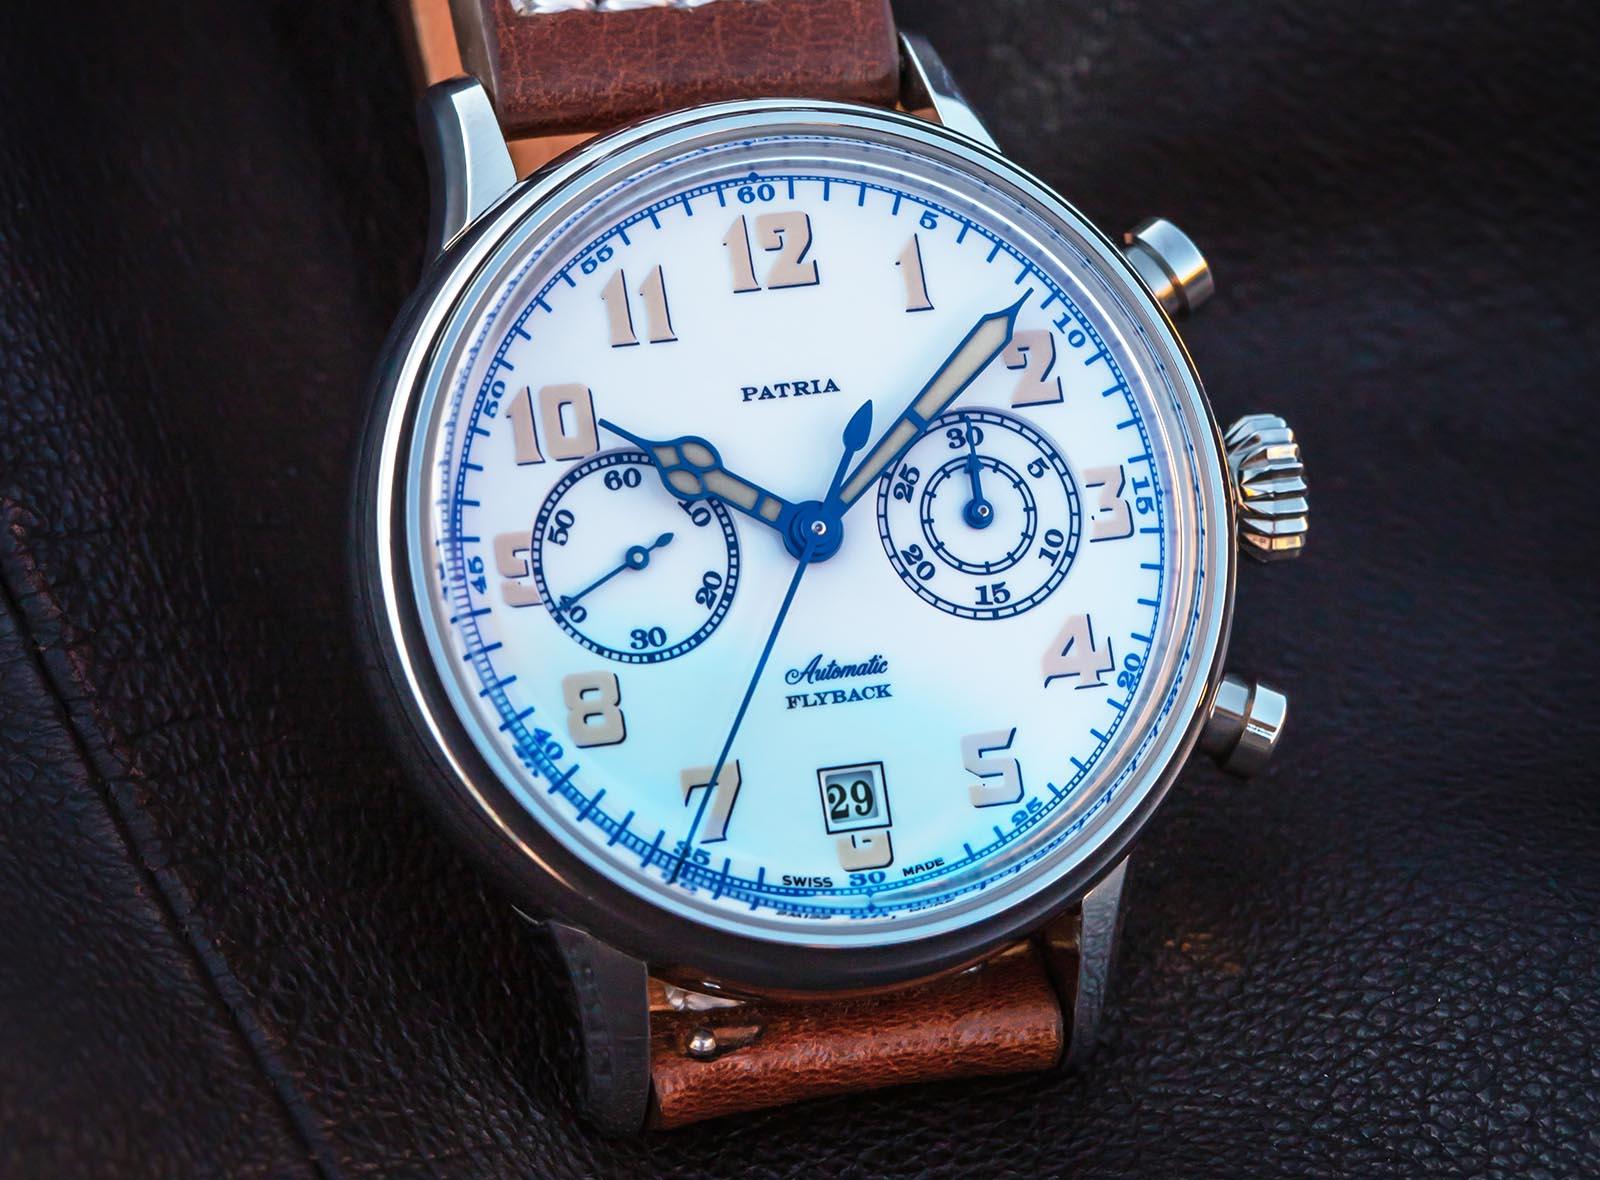 Patria Brigadier Chronograph 6